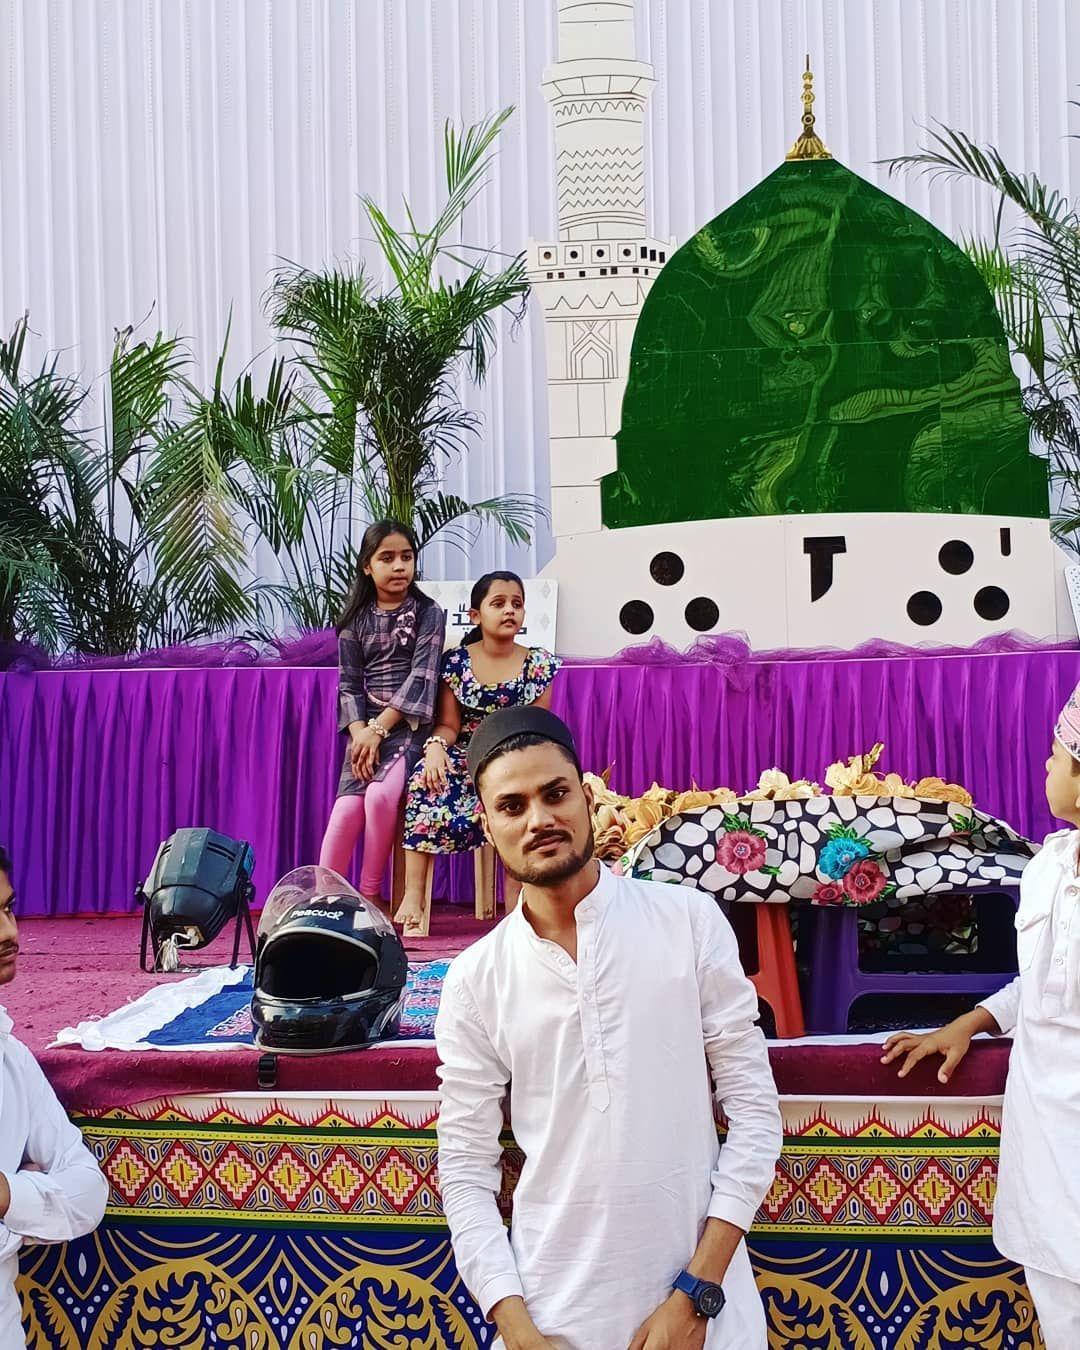 #eidmubarak #kbye #amir_khan_c_r #followforfollowback #blessed #keepgoing #keeploving #keepsupporting...